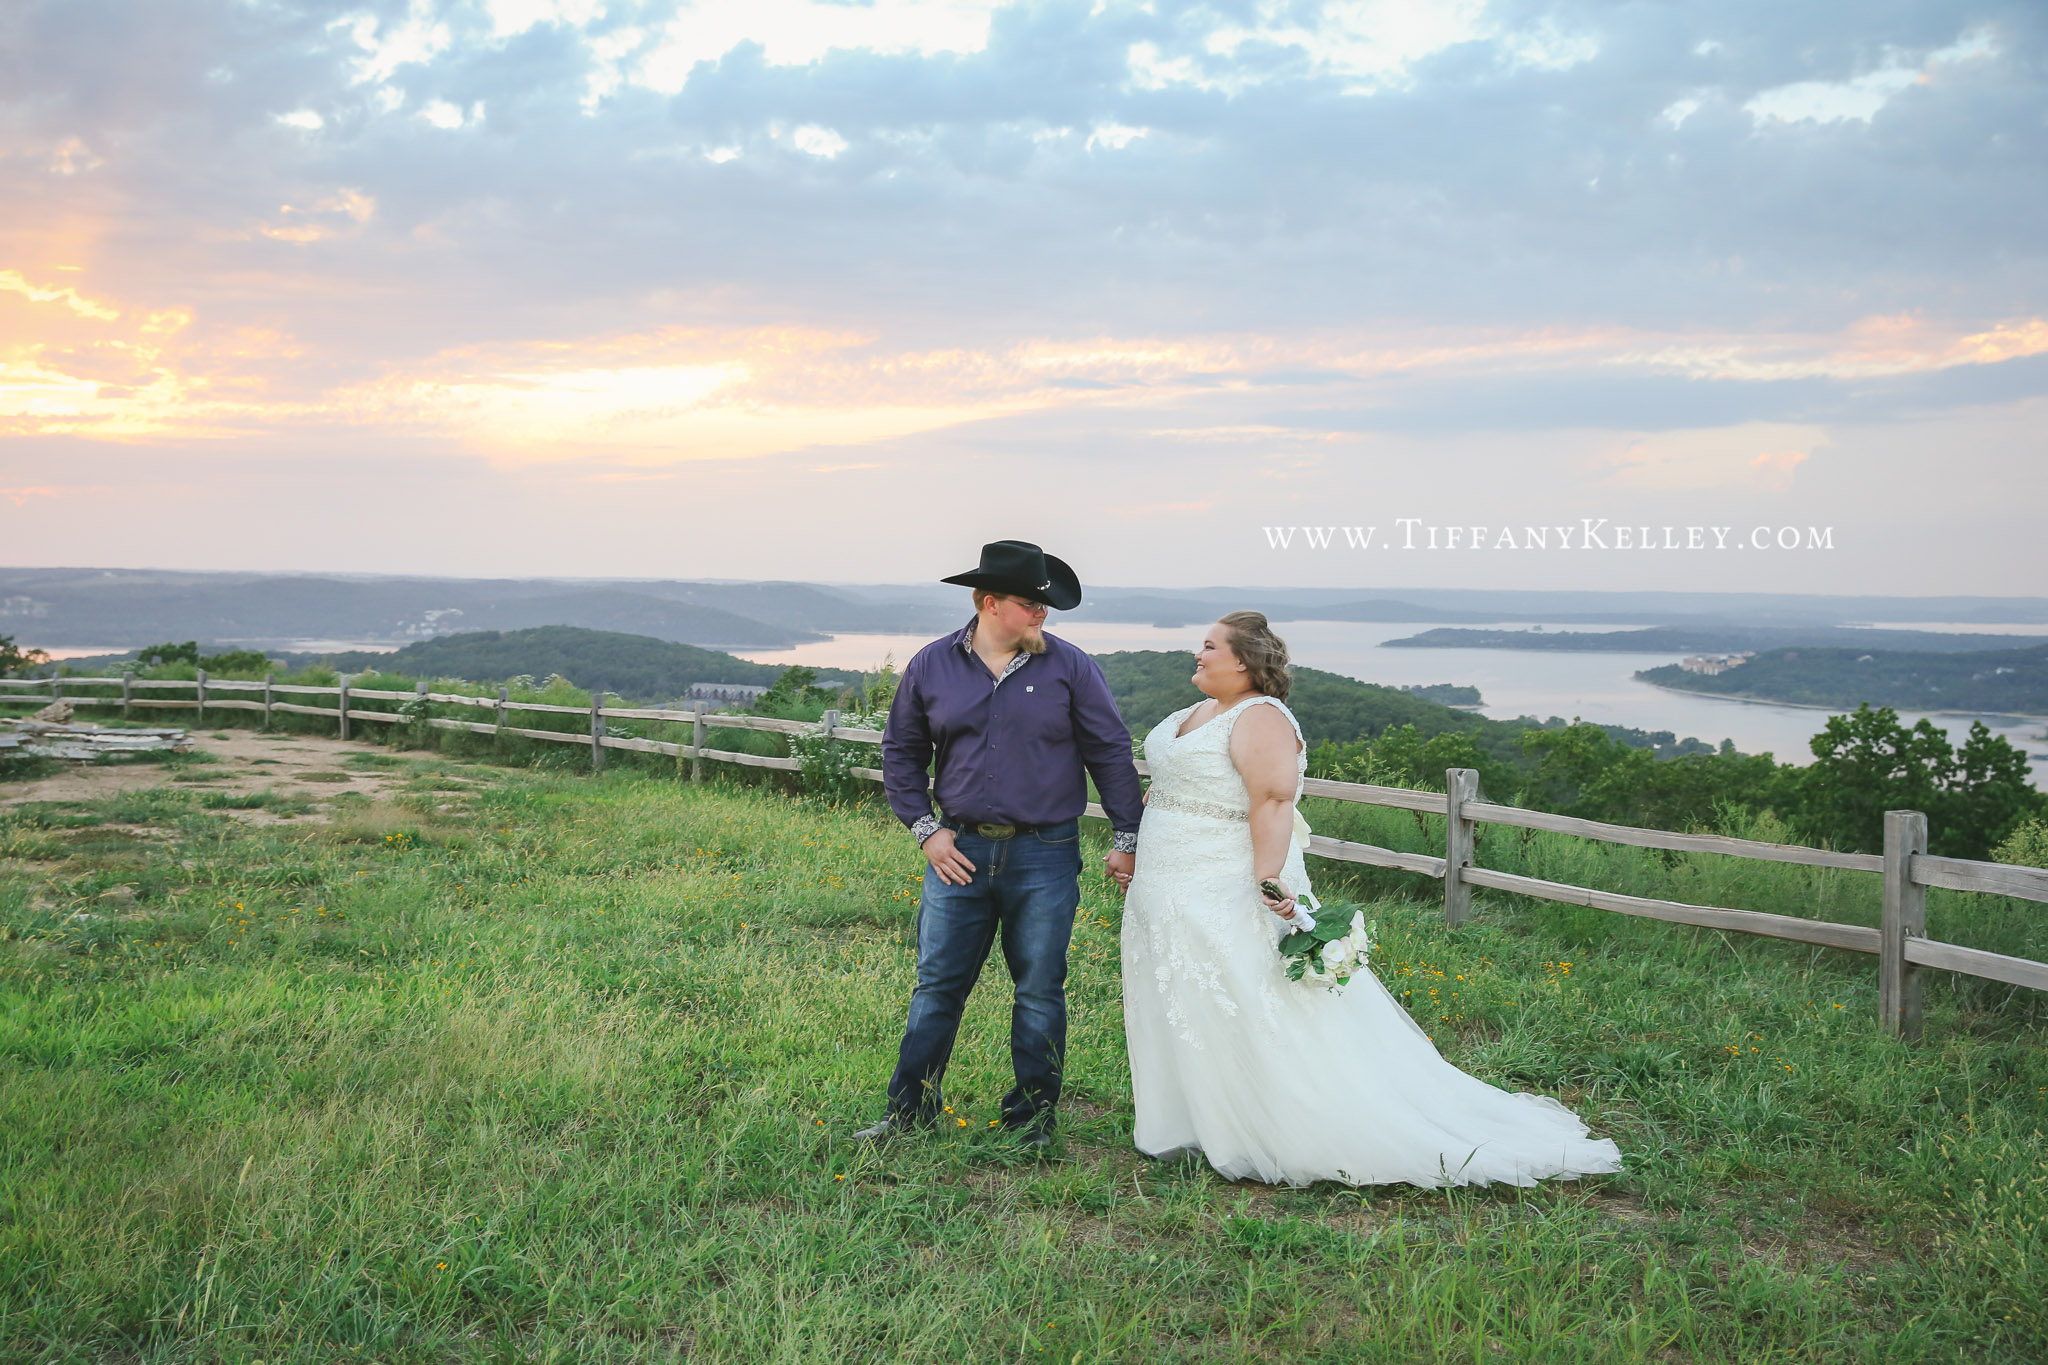 branson-missouri-big-cedar-lodge-wedding-photographer-tiffany-kelley-photography-01